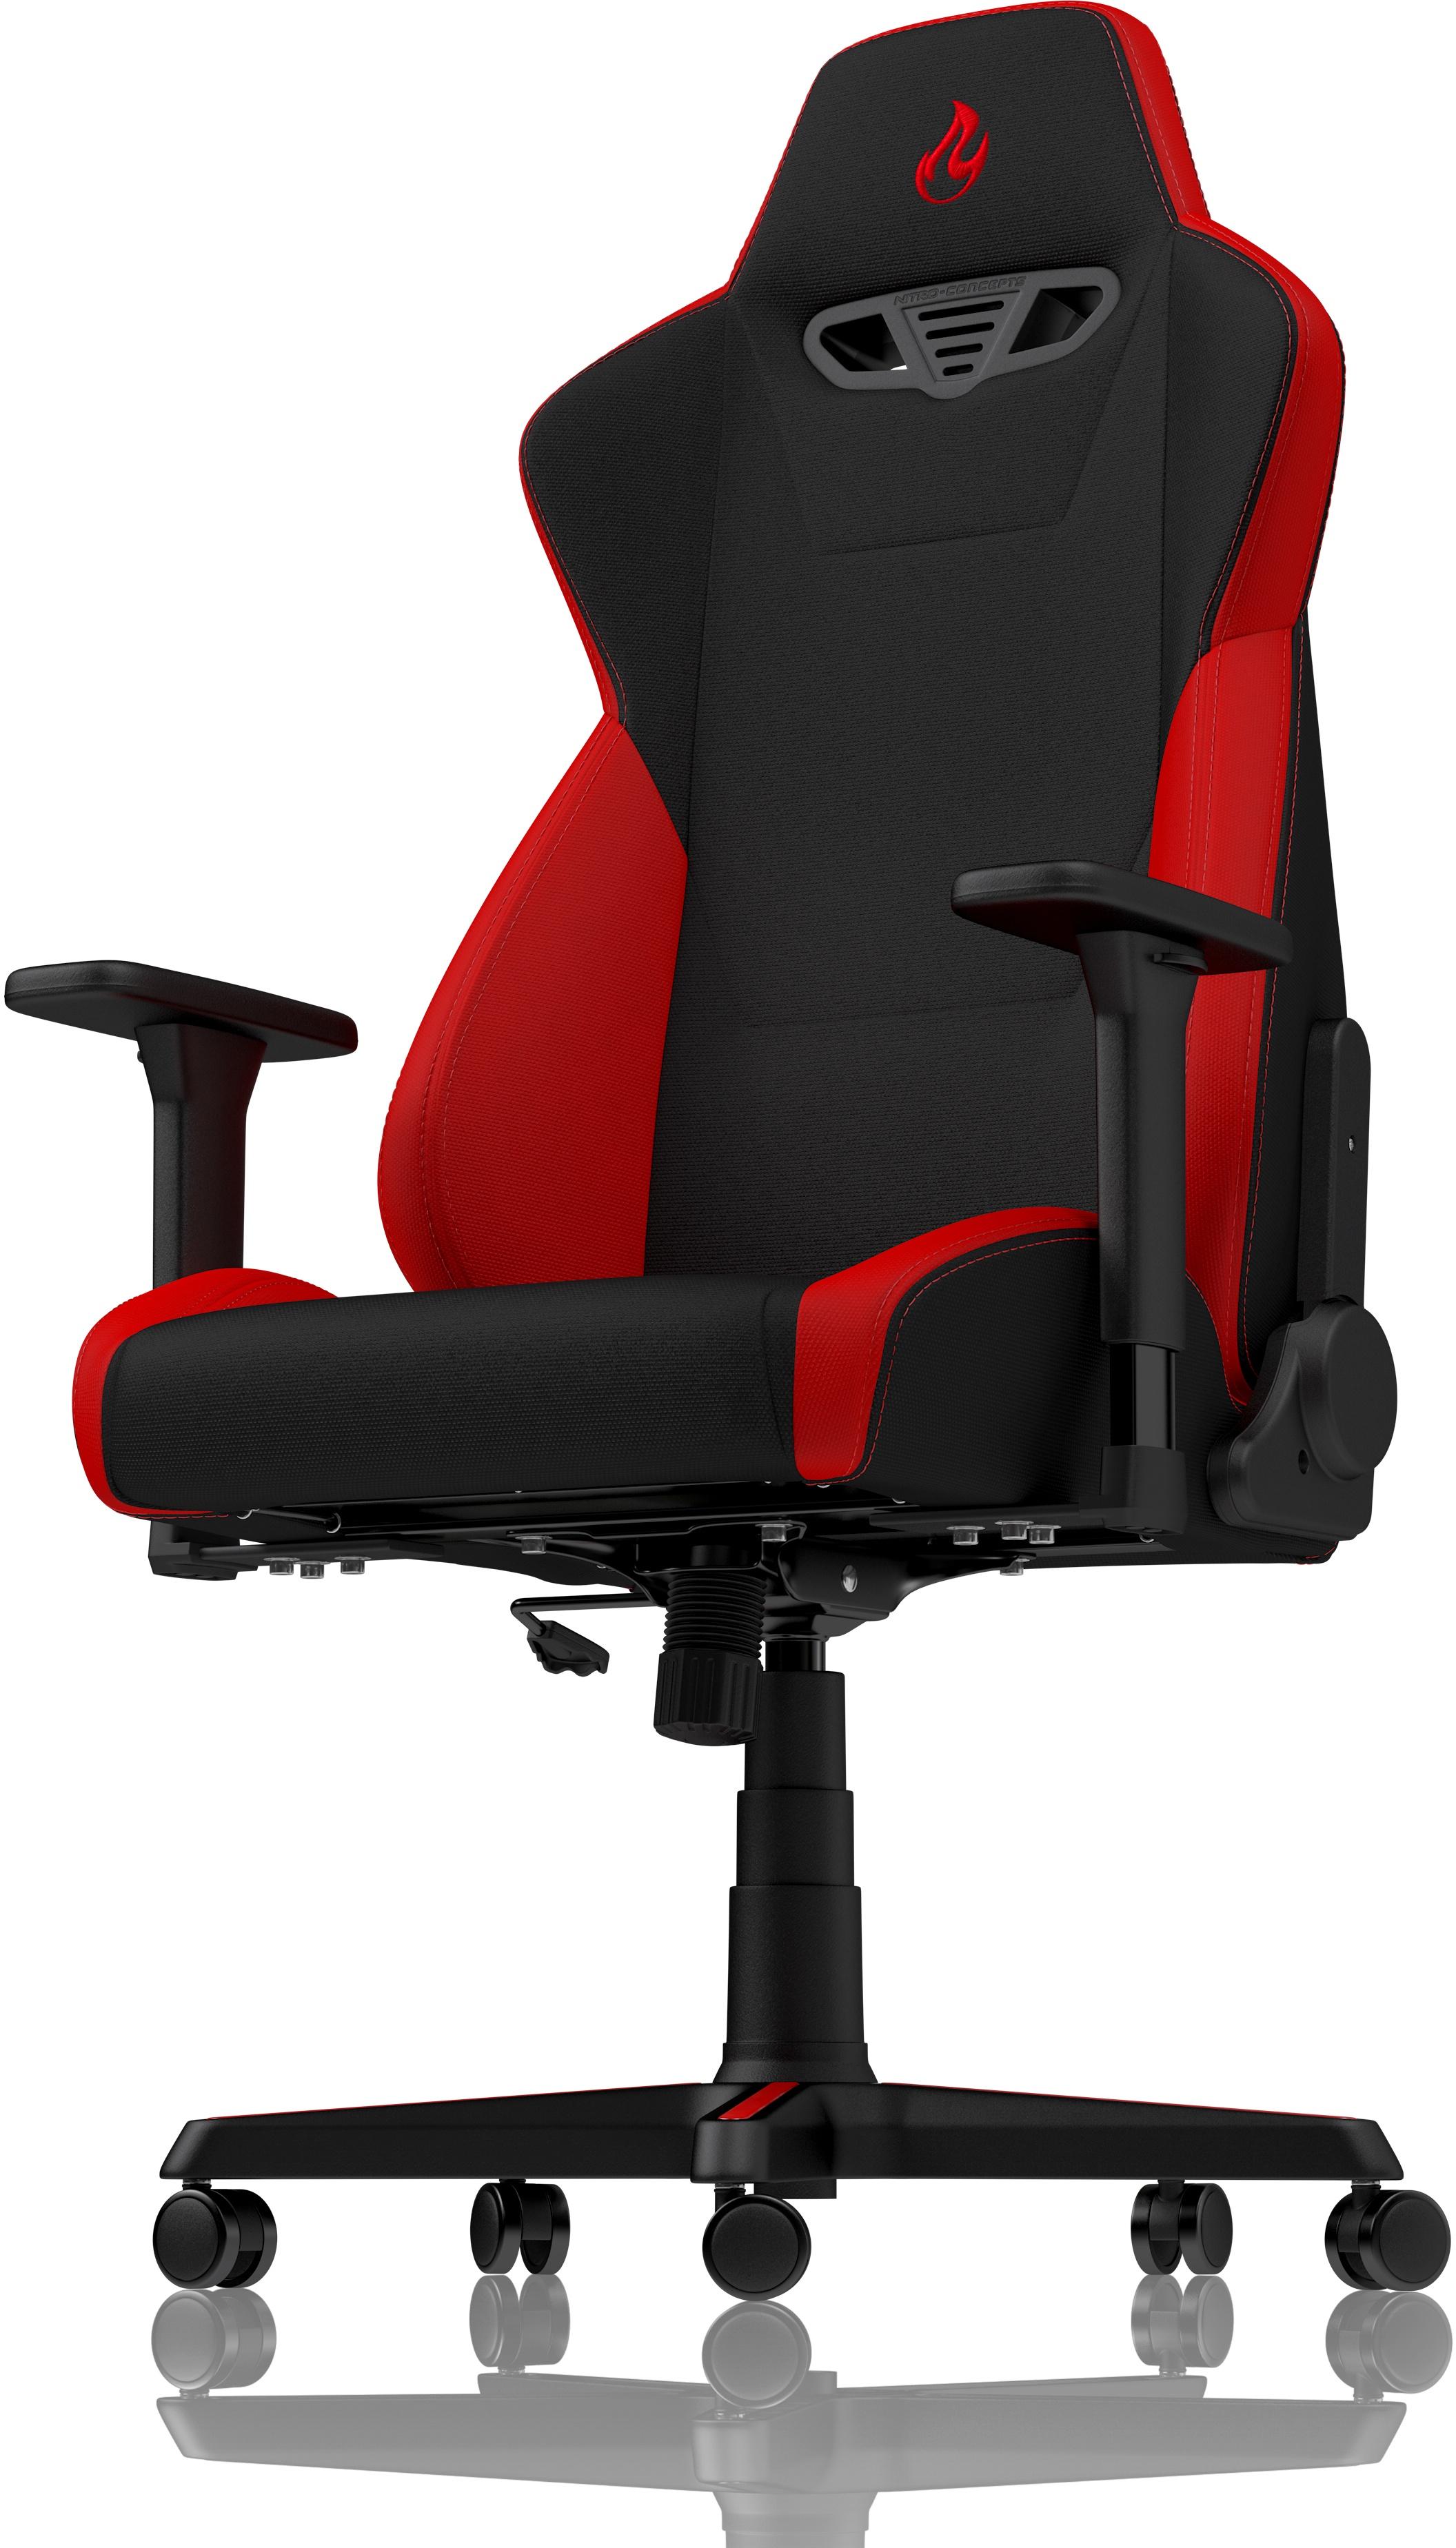 Miraculous Nitro Concepts S300 Zwart Rood Dutchiee Userreviews Uwap Interior Chair Design Uwaporg